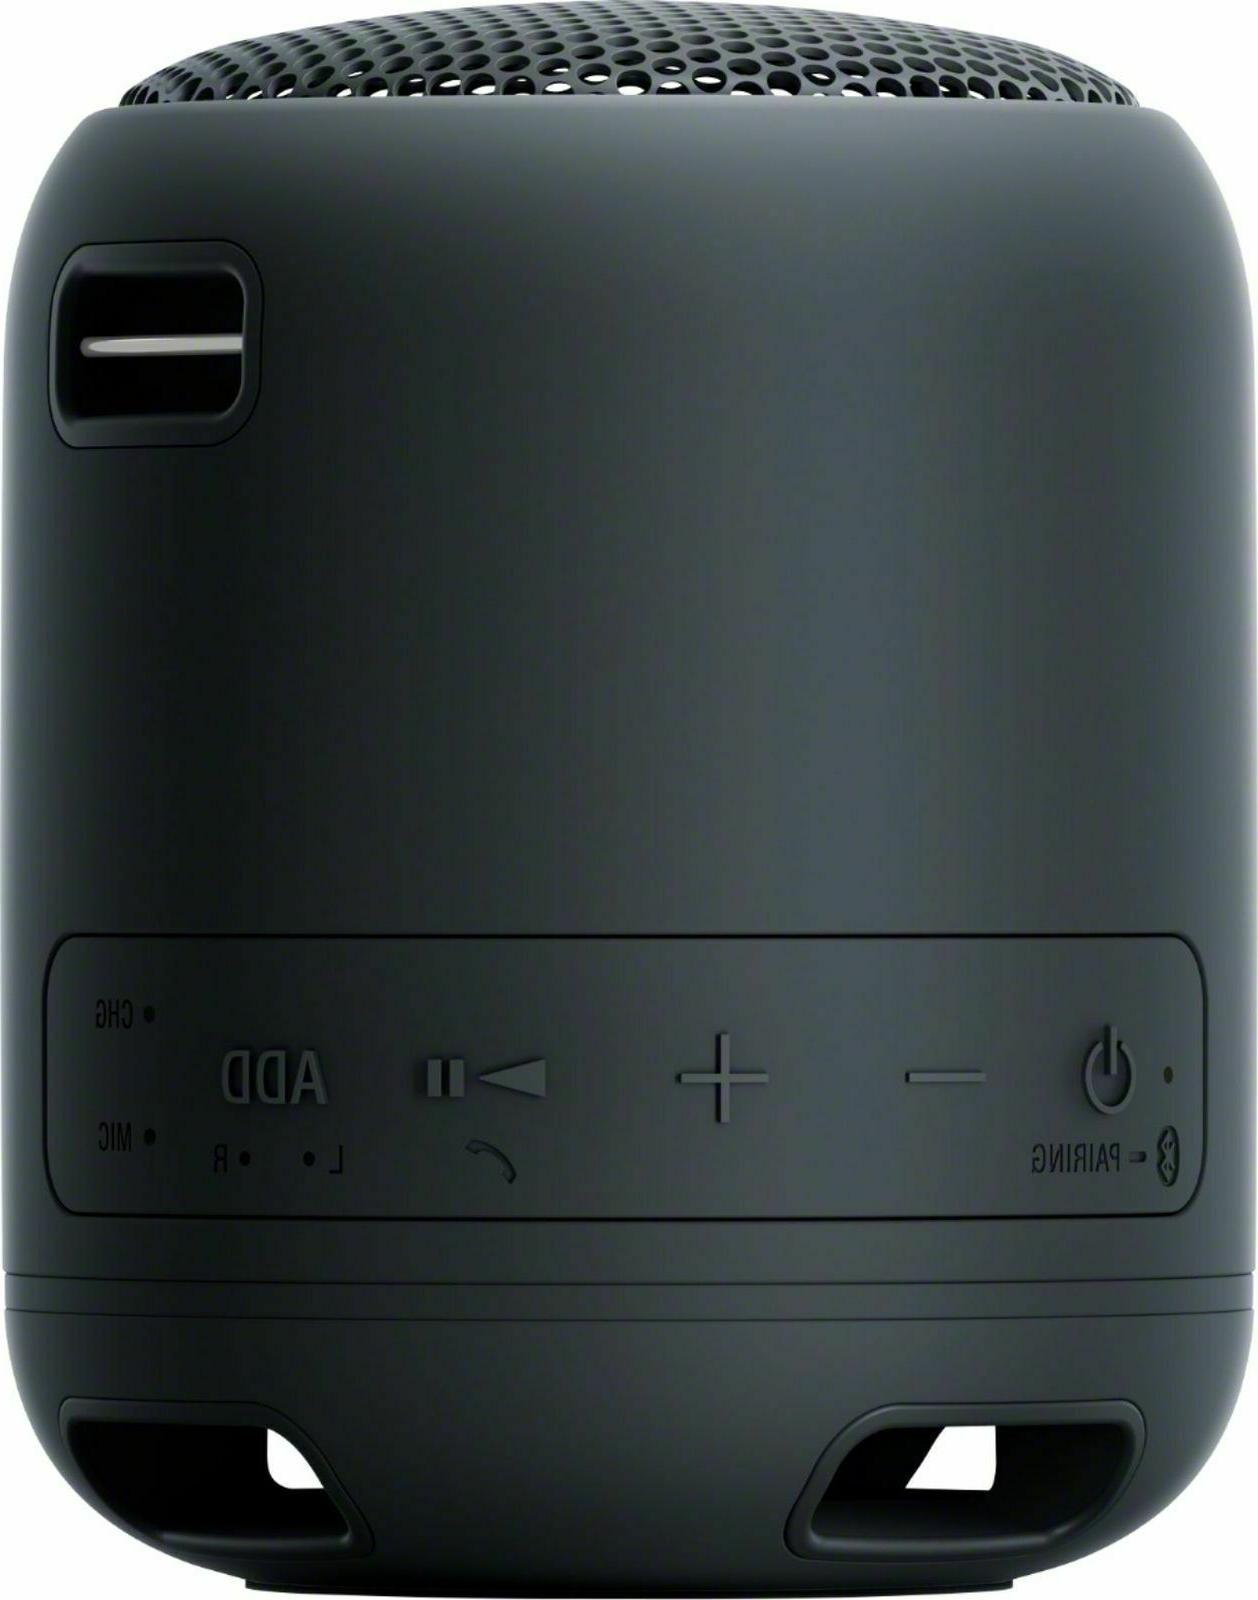 Sony Portable Speaker New in Box Shipping